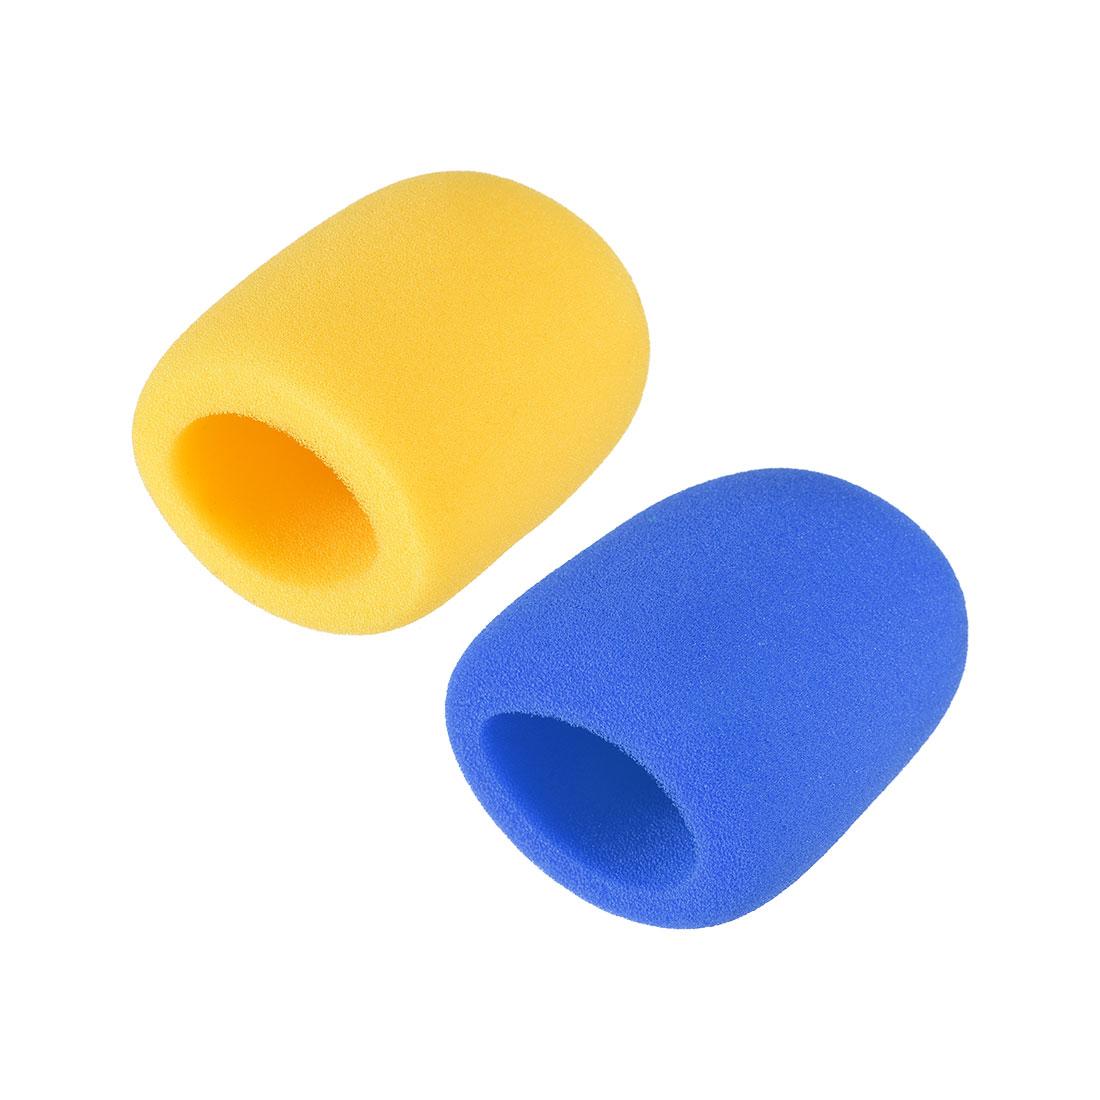 2PCS Sponge Foam Mic Cover Handheld Microphone Windscreen Blue Yellow for KTV